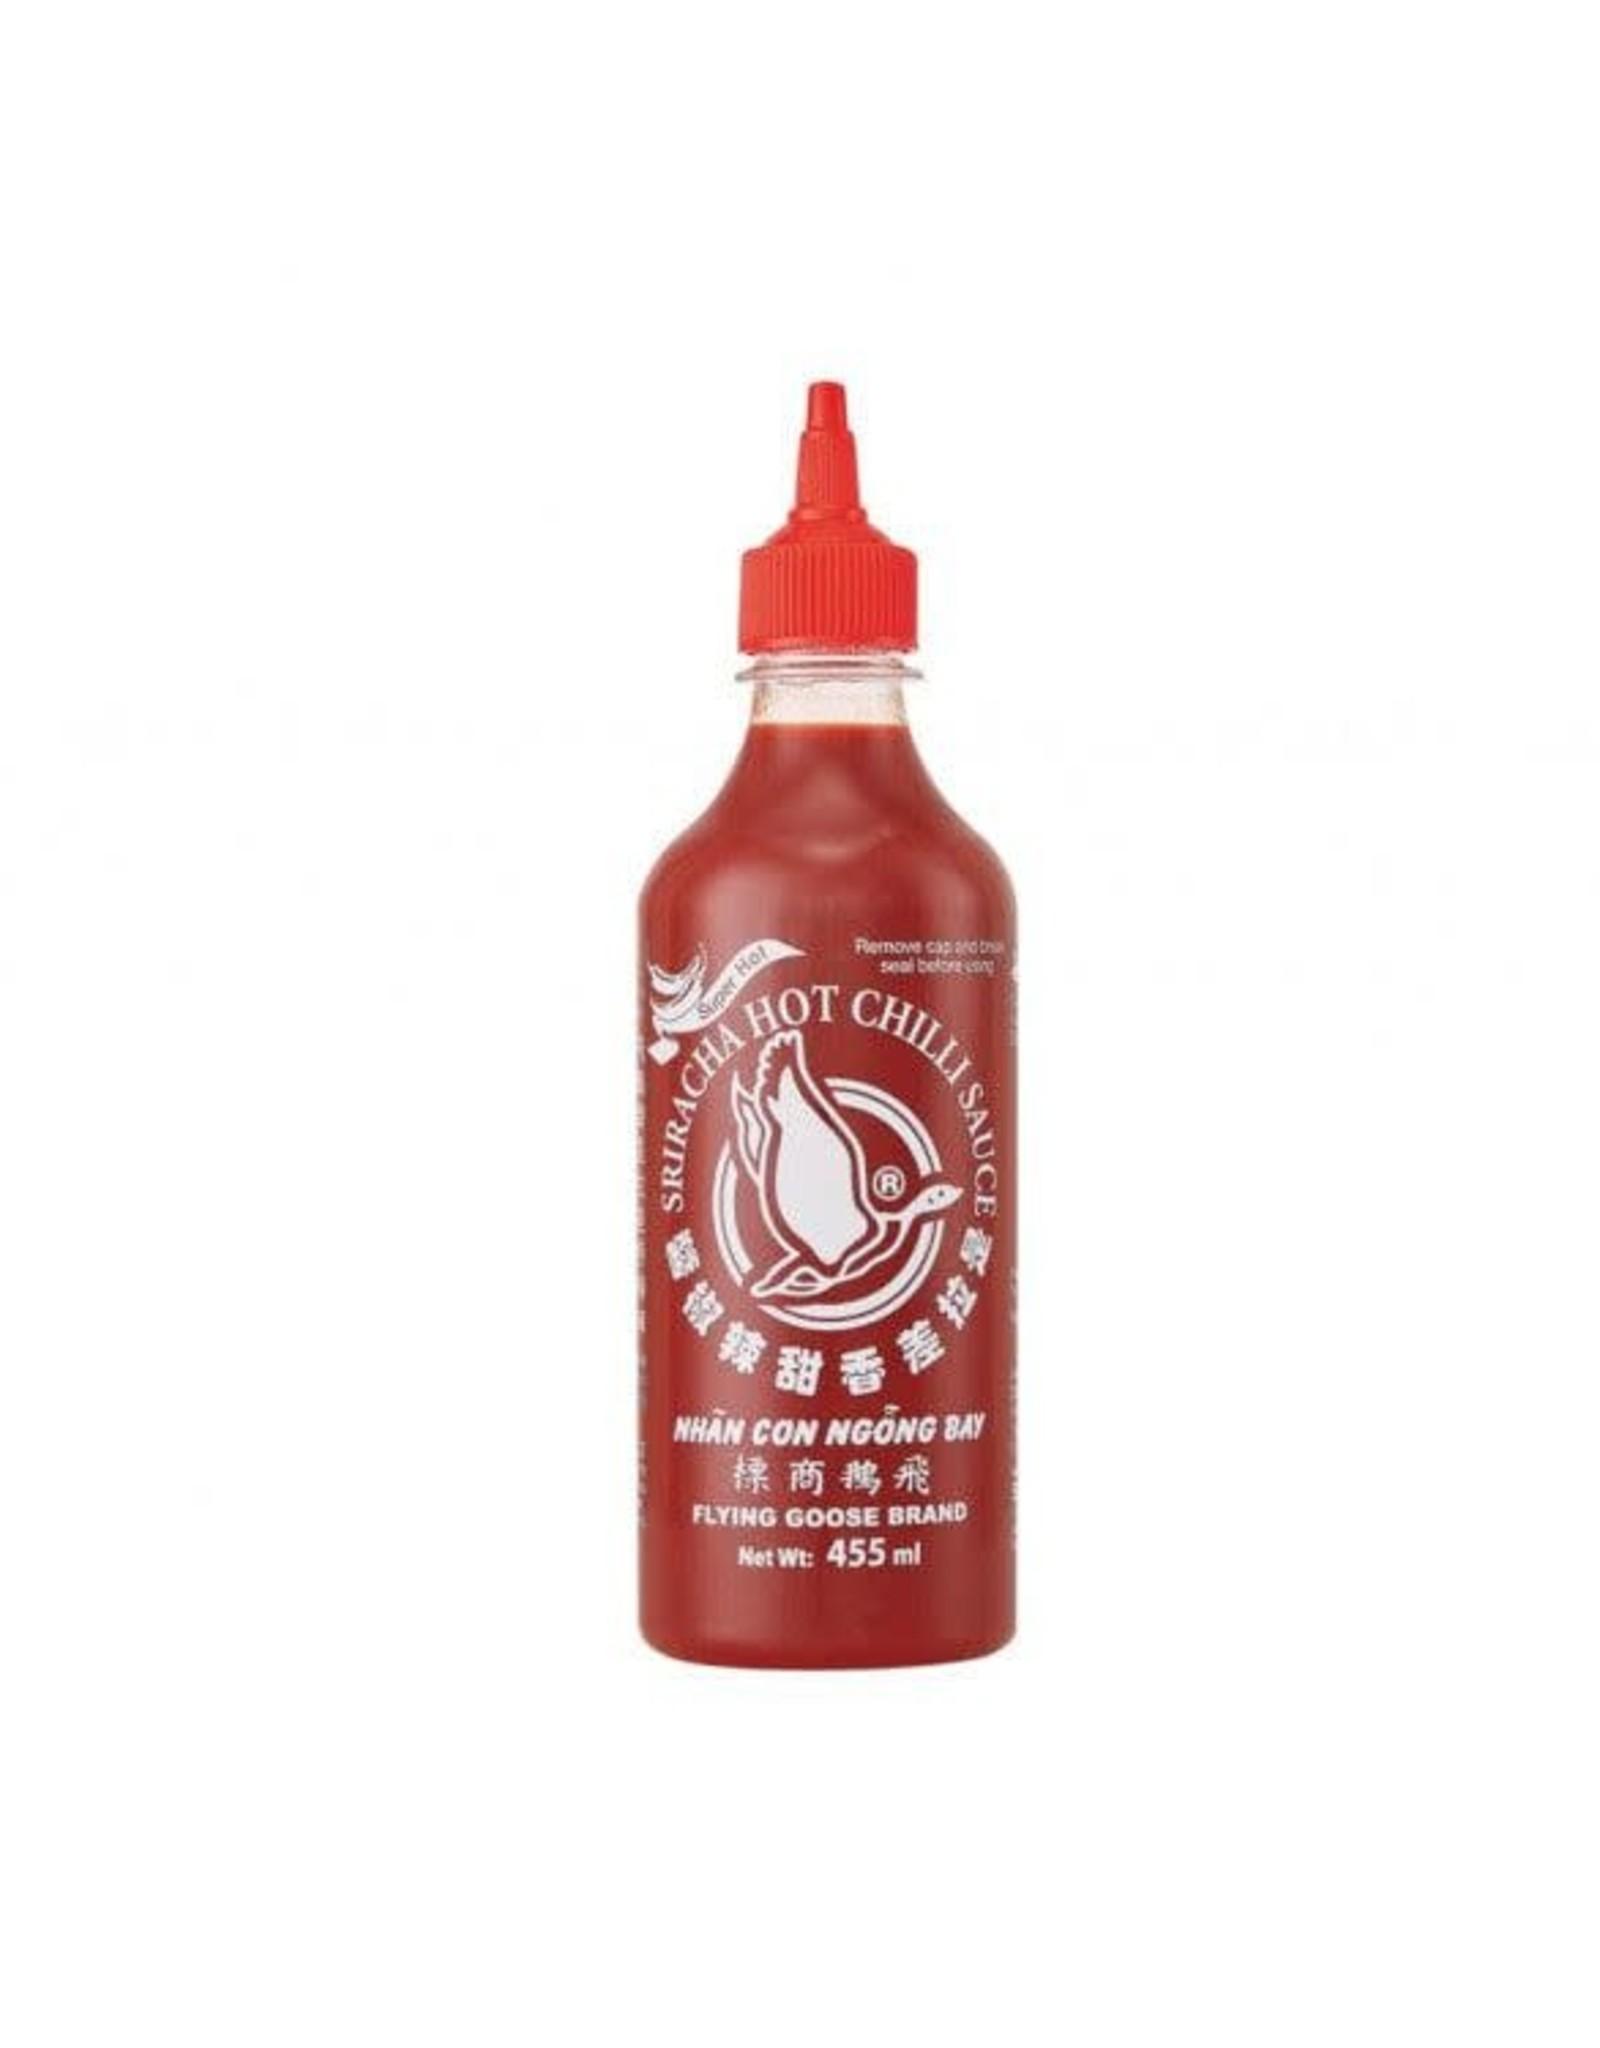 Flying Goose Copy of Sriracha FG btl 455ml